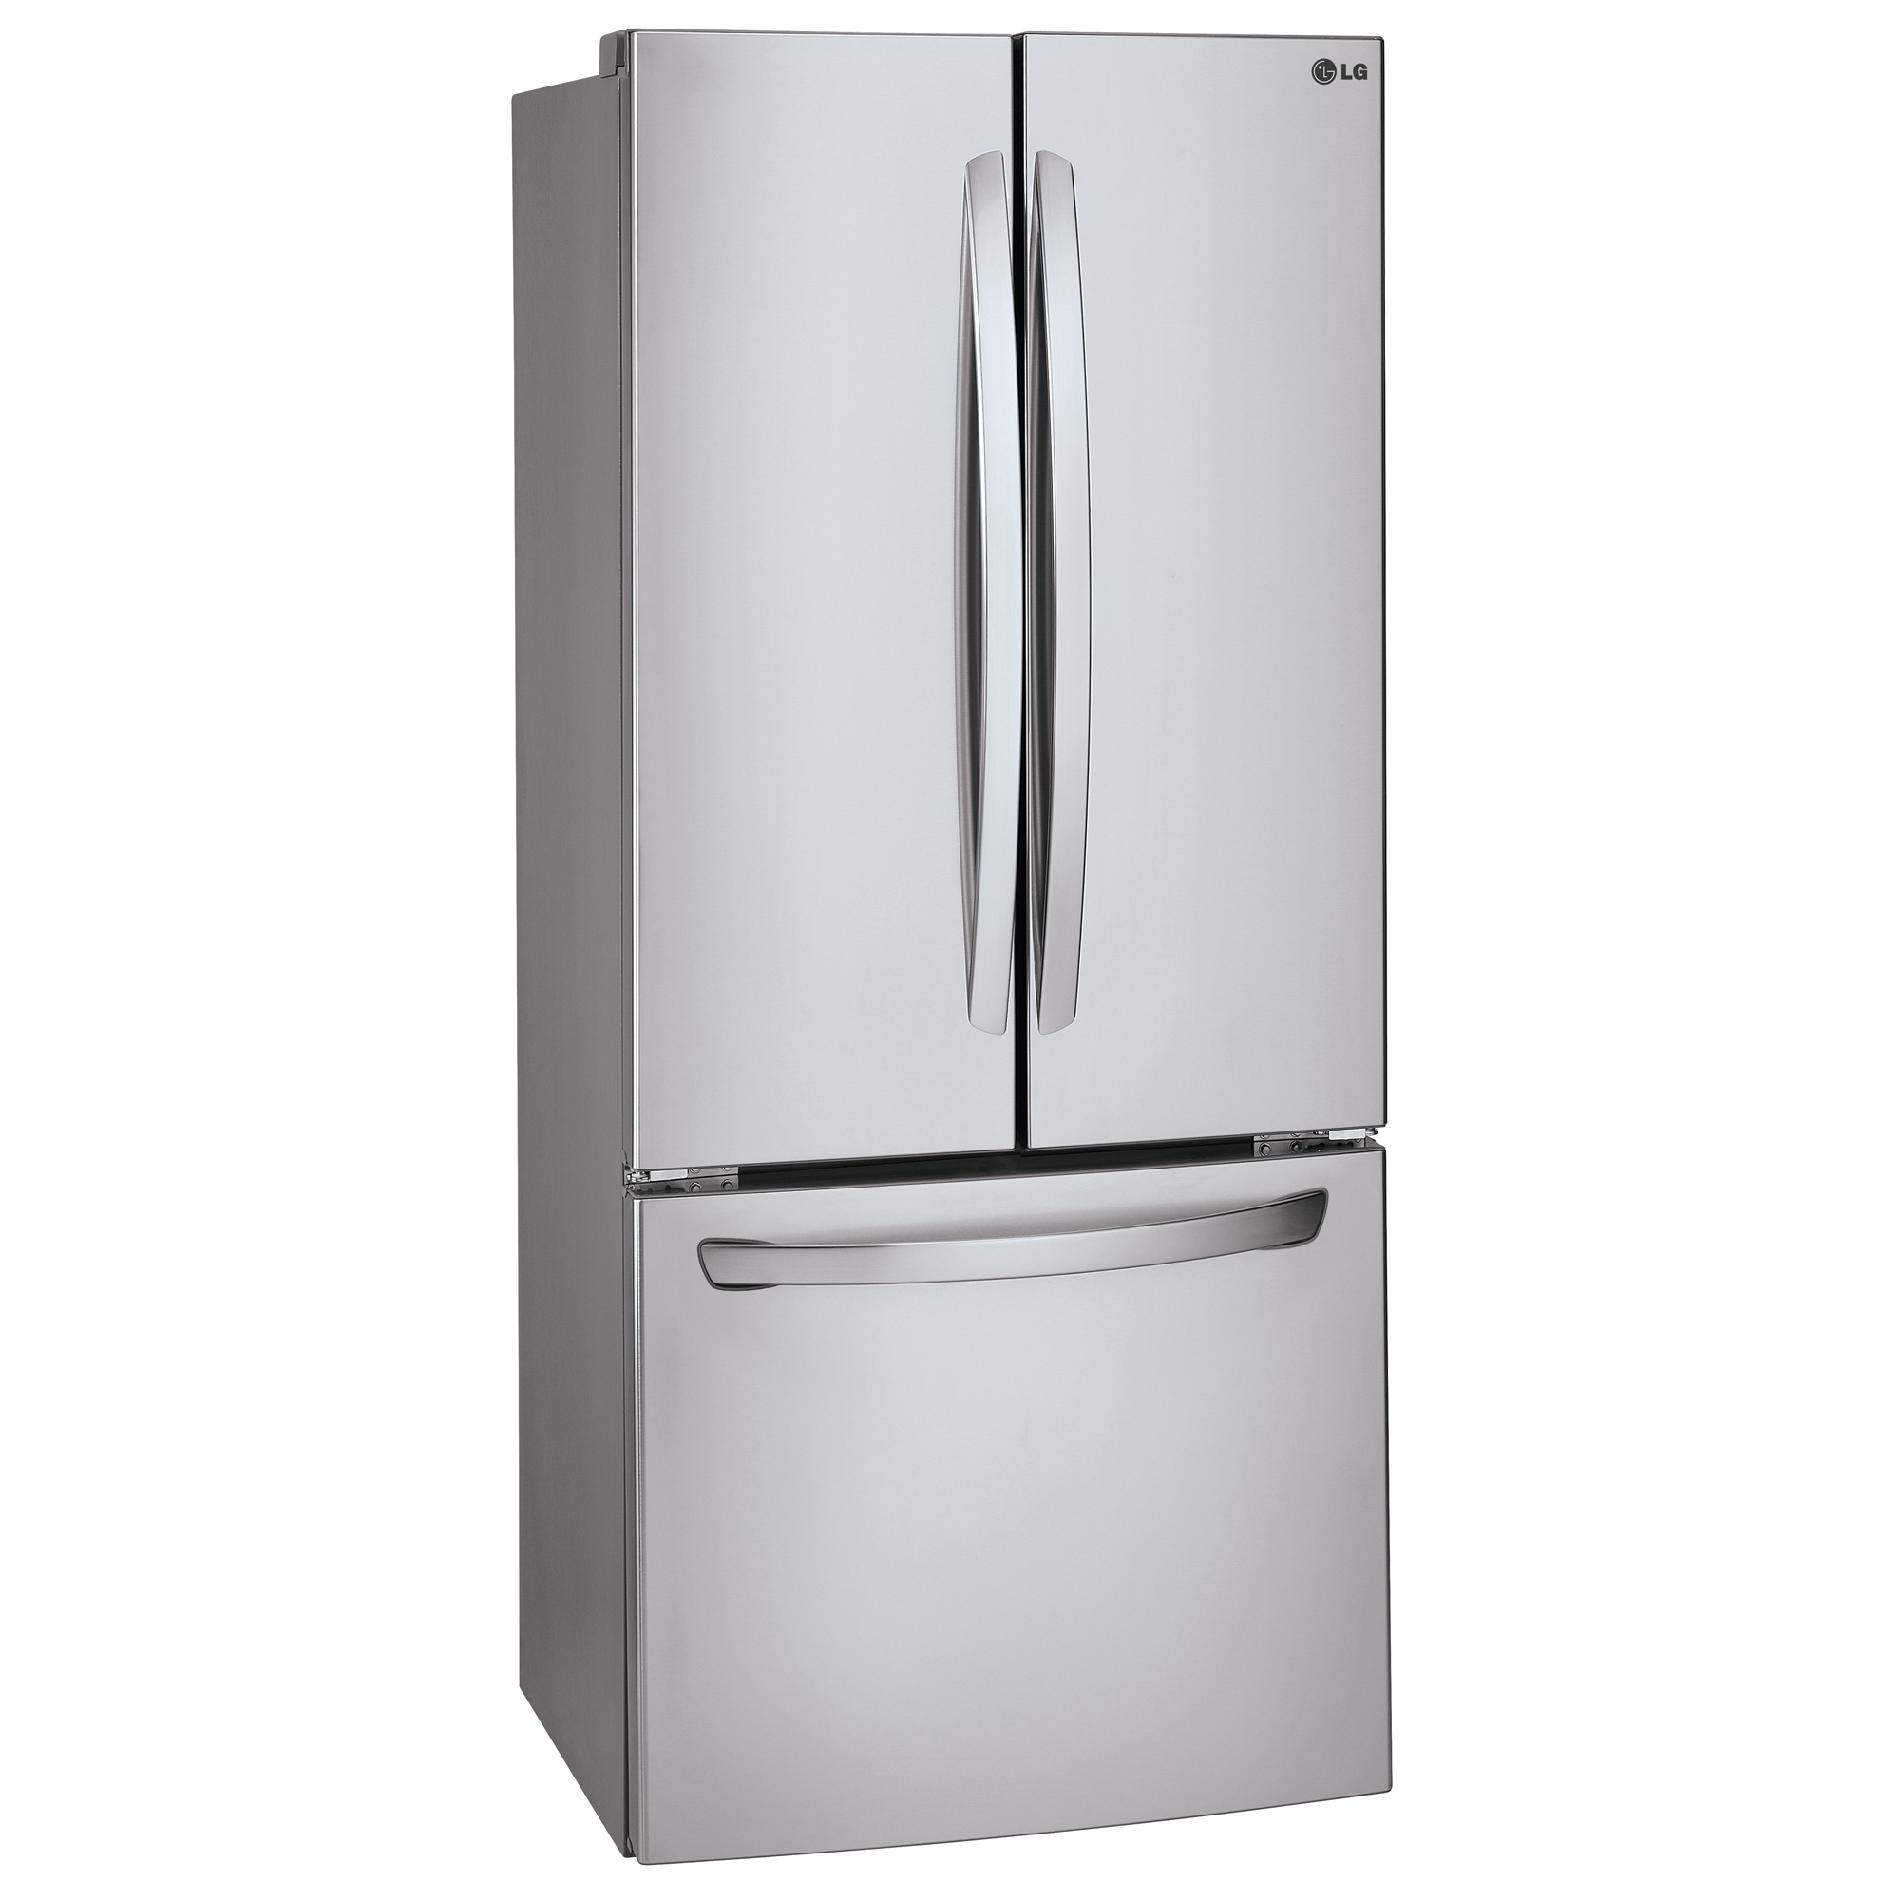 LG 22 cu. ft. French Door Bottom-Freezer Refrigerator